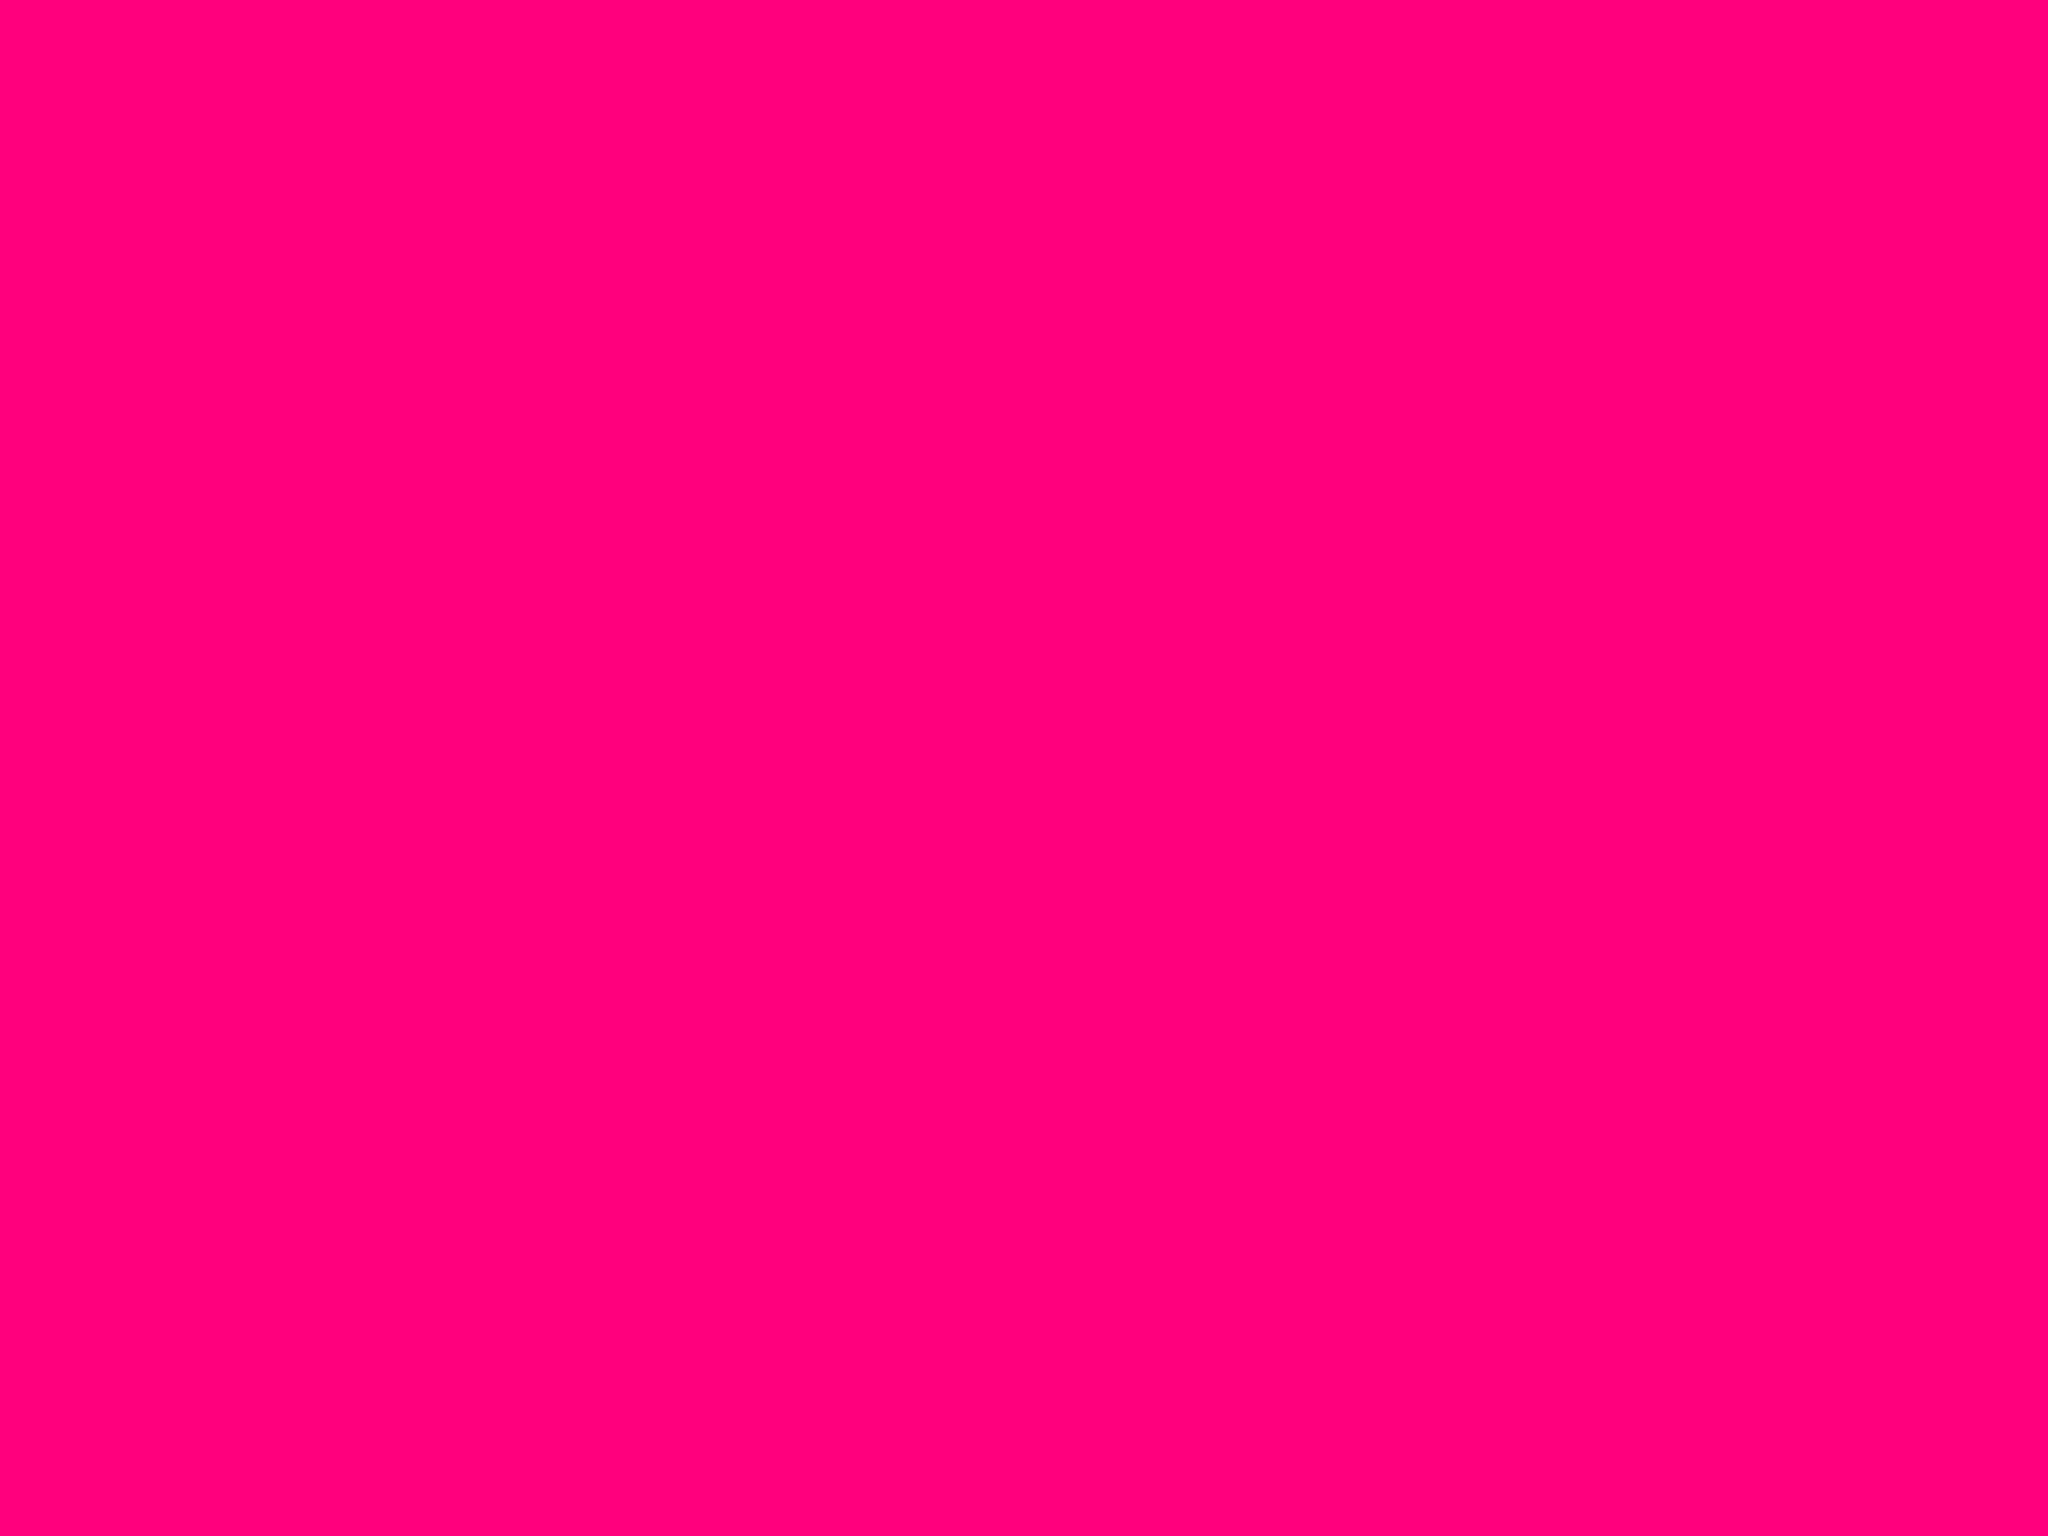 2048x1536 Rose Solid Color Background